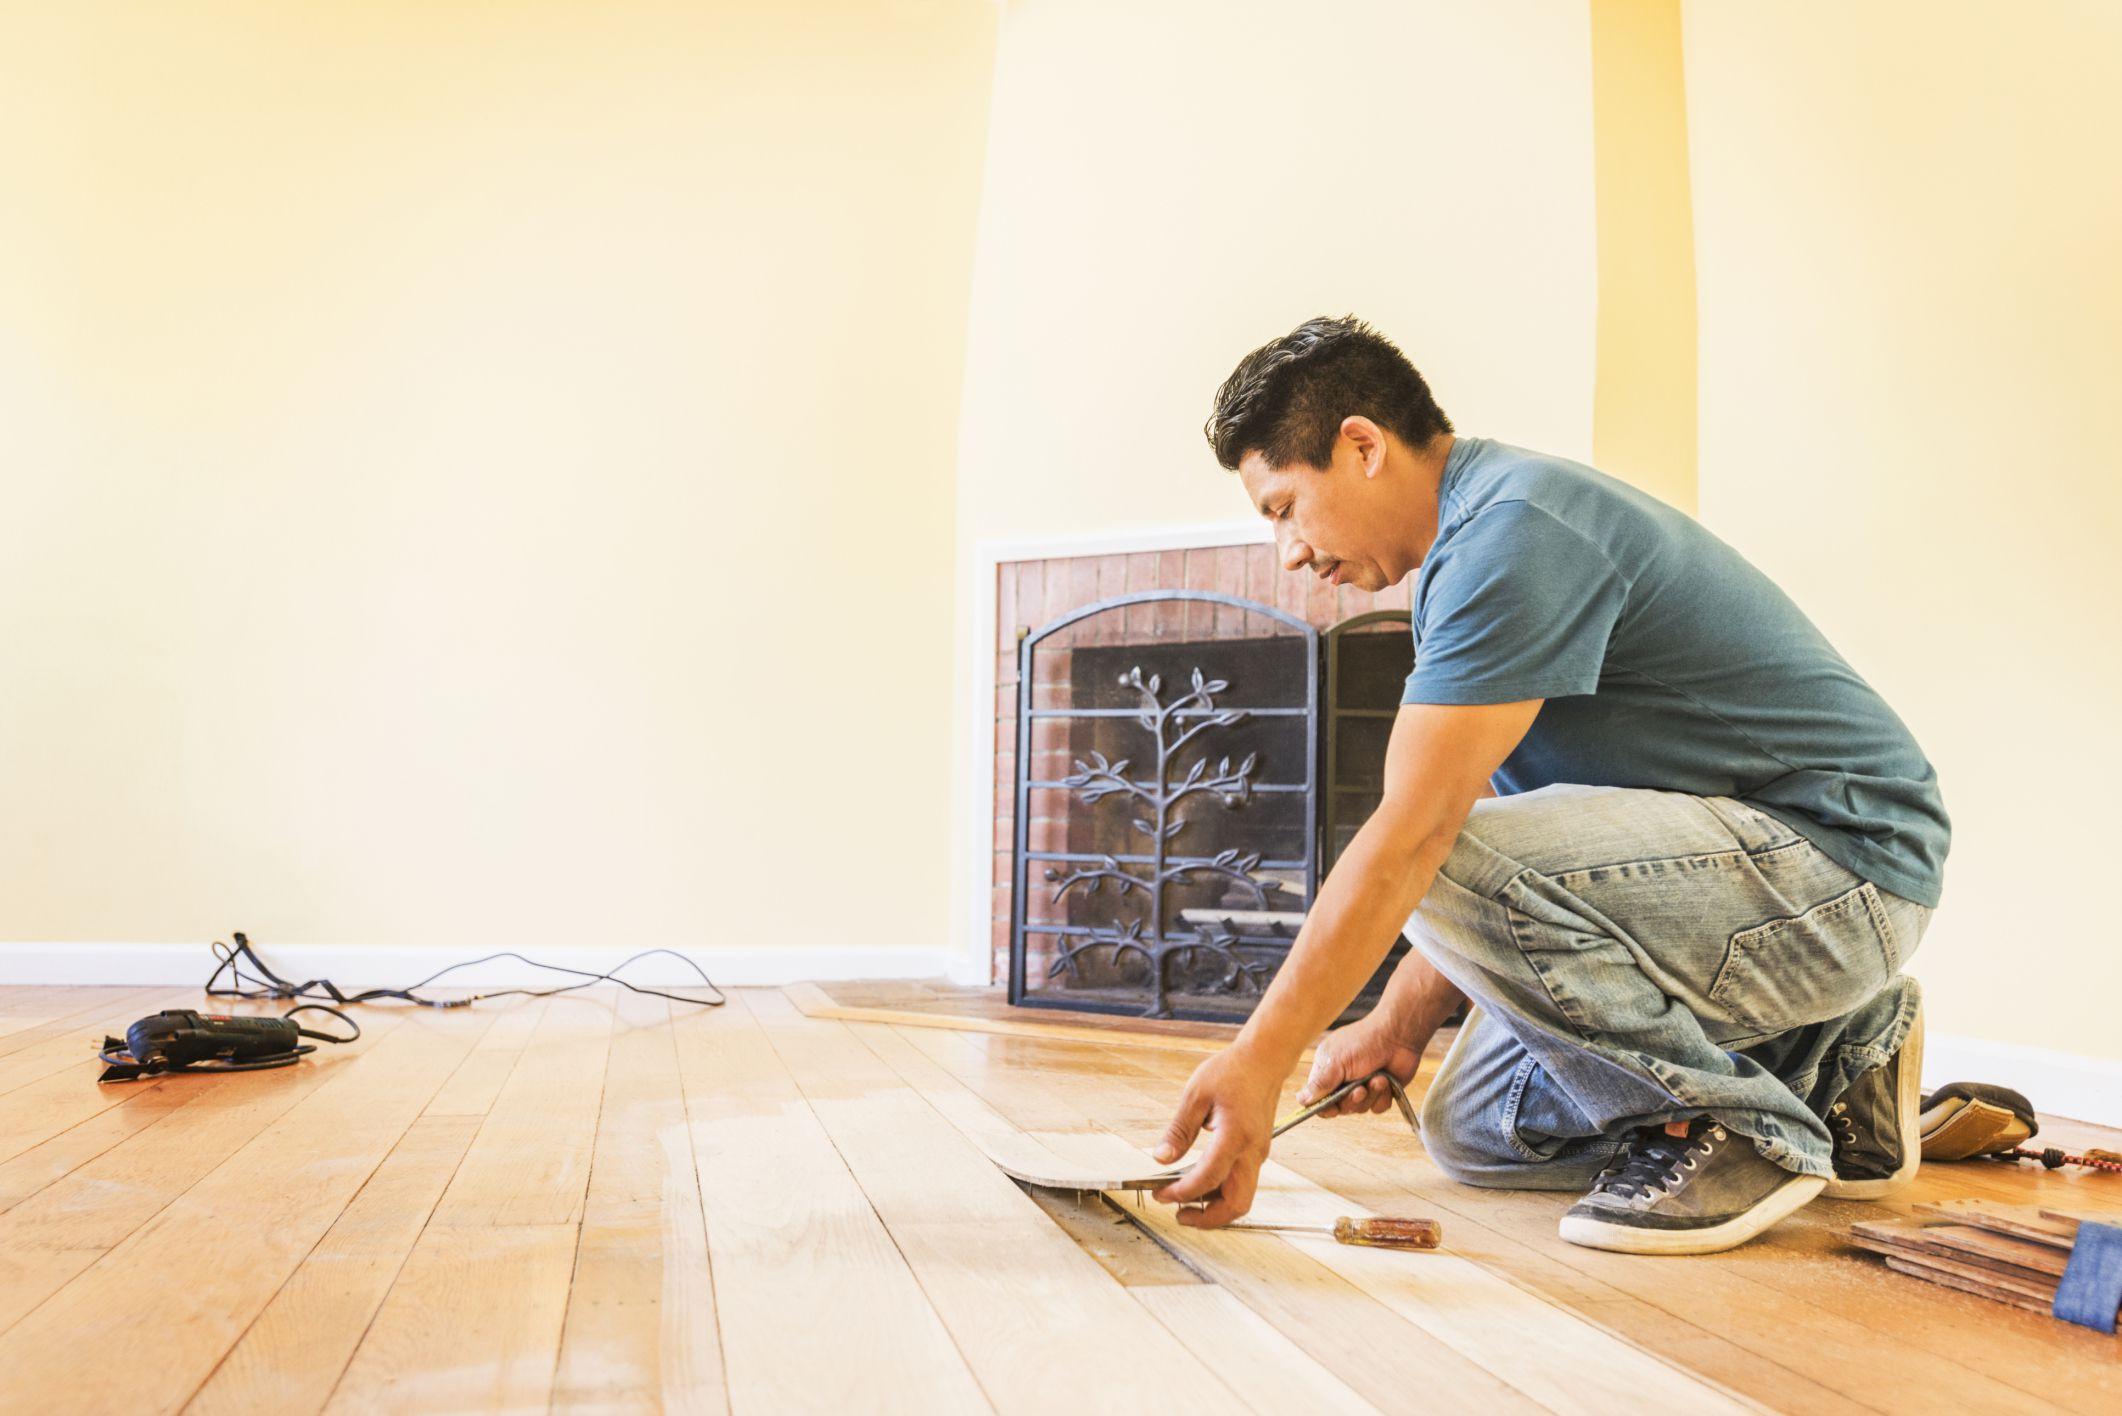 1 2 engineered hardwood flooring of solid hardwood flooring costs for professional vs diy inside installwoodflooring 592016327 56684d6f3df78ce1610a598a